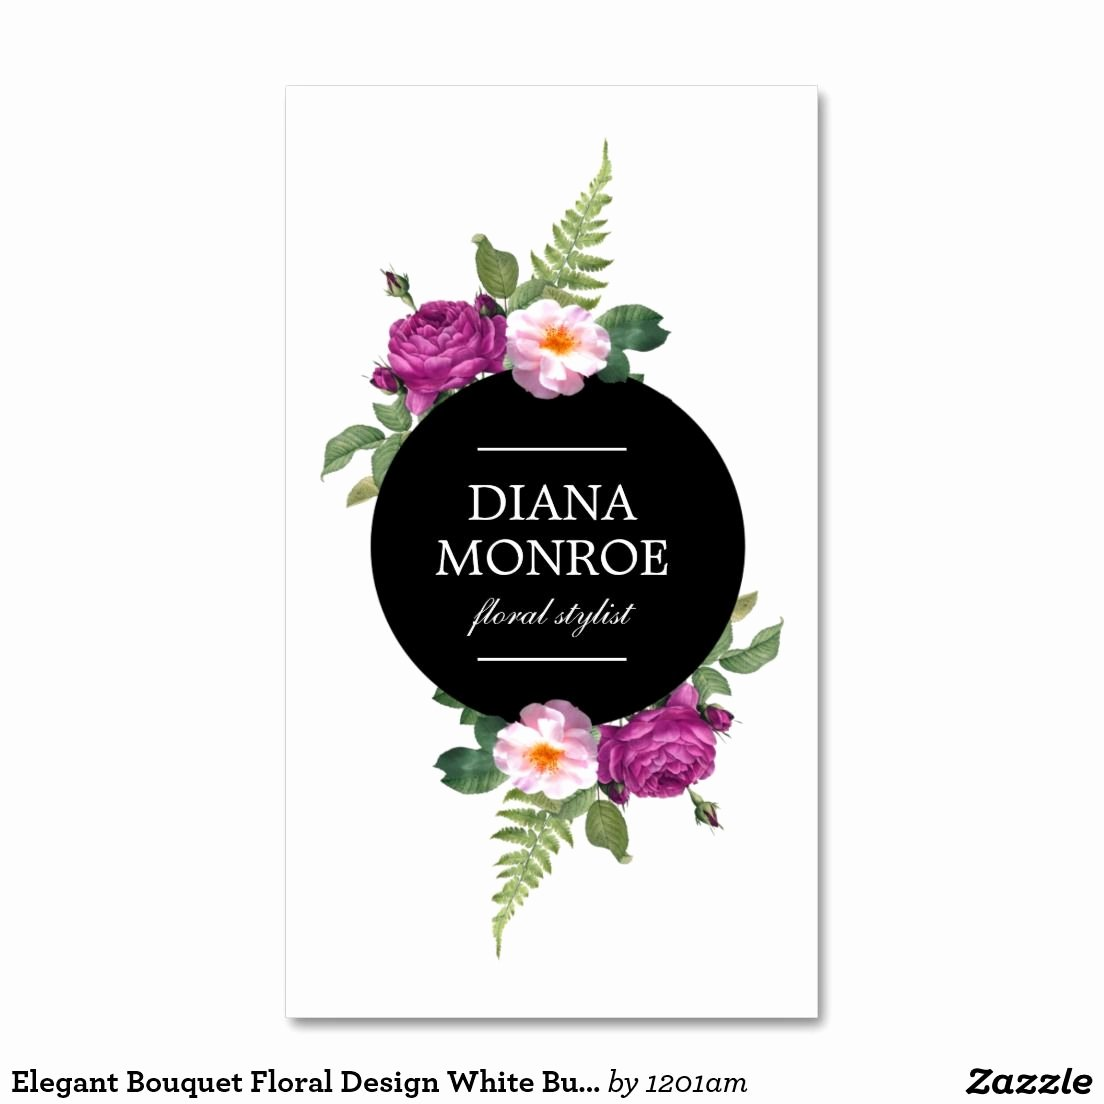 Florist Business Cards Design Awesome Designer Business Card Template for Florists Flower Shops